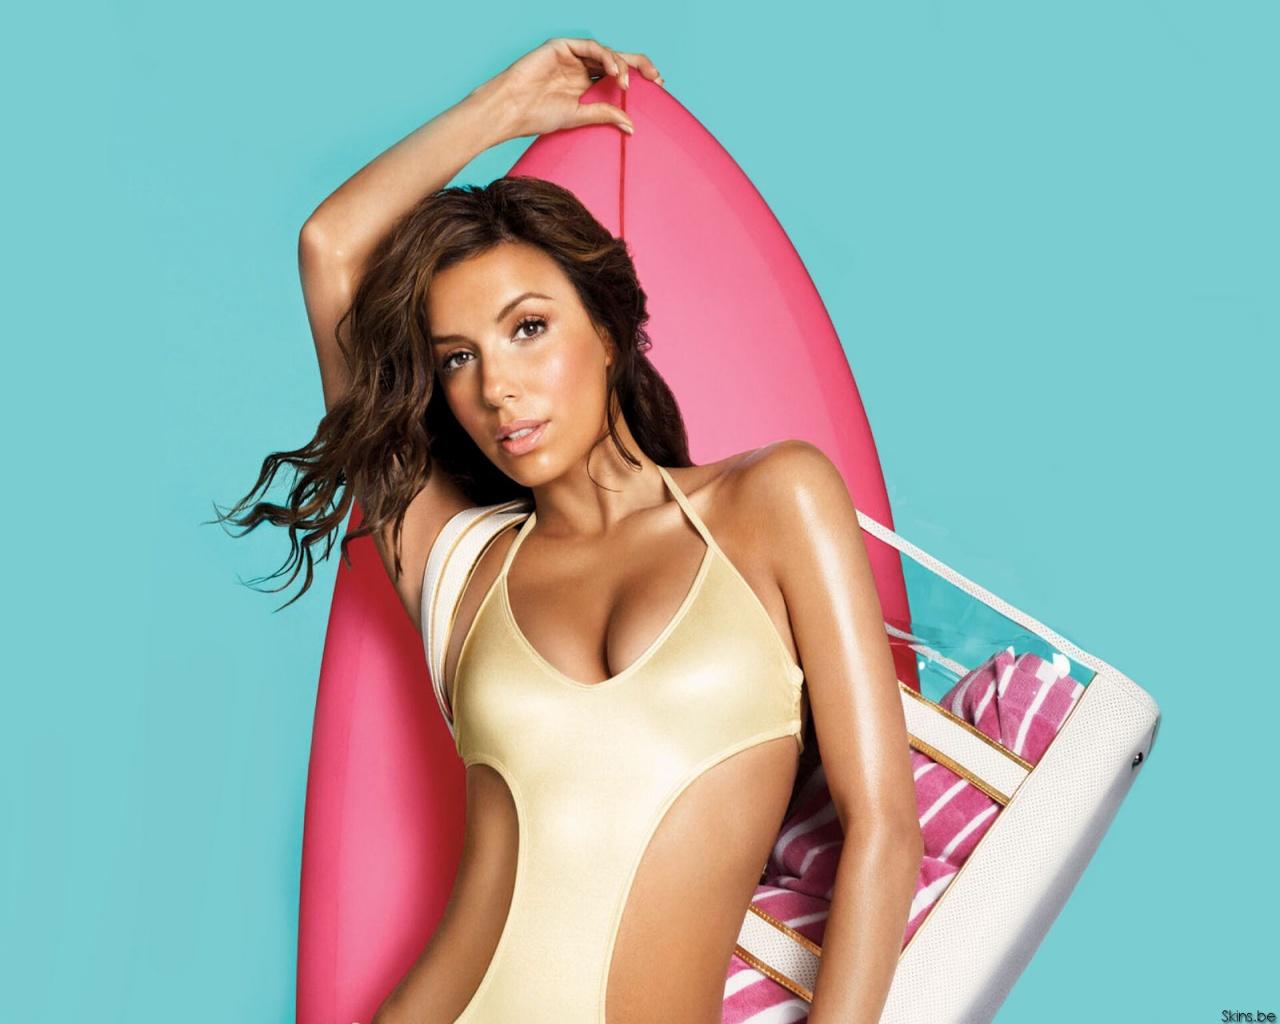 http://3.bp.blogspot.com/-_J-ED9r4sNE/Tlez5S-ItPI/AAAAAAAAJ2g/sJrbnbhkl-0/s1600/hollywood-actress-Eva-Longoria-glamorous.jpg